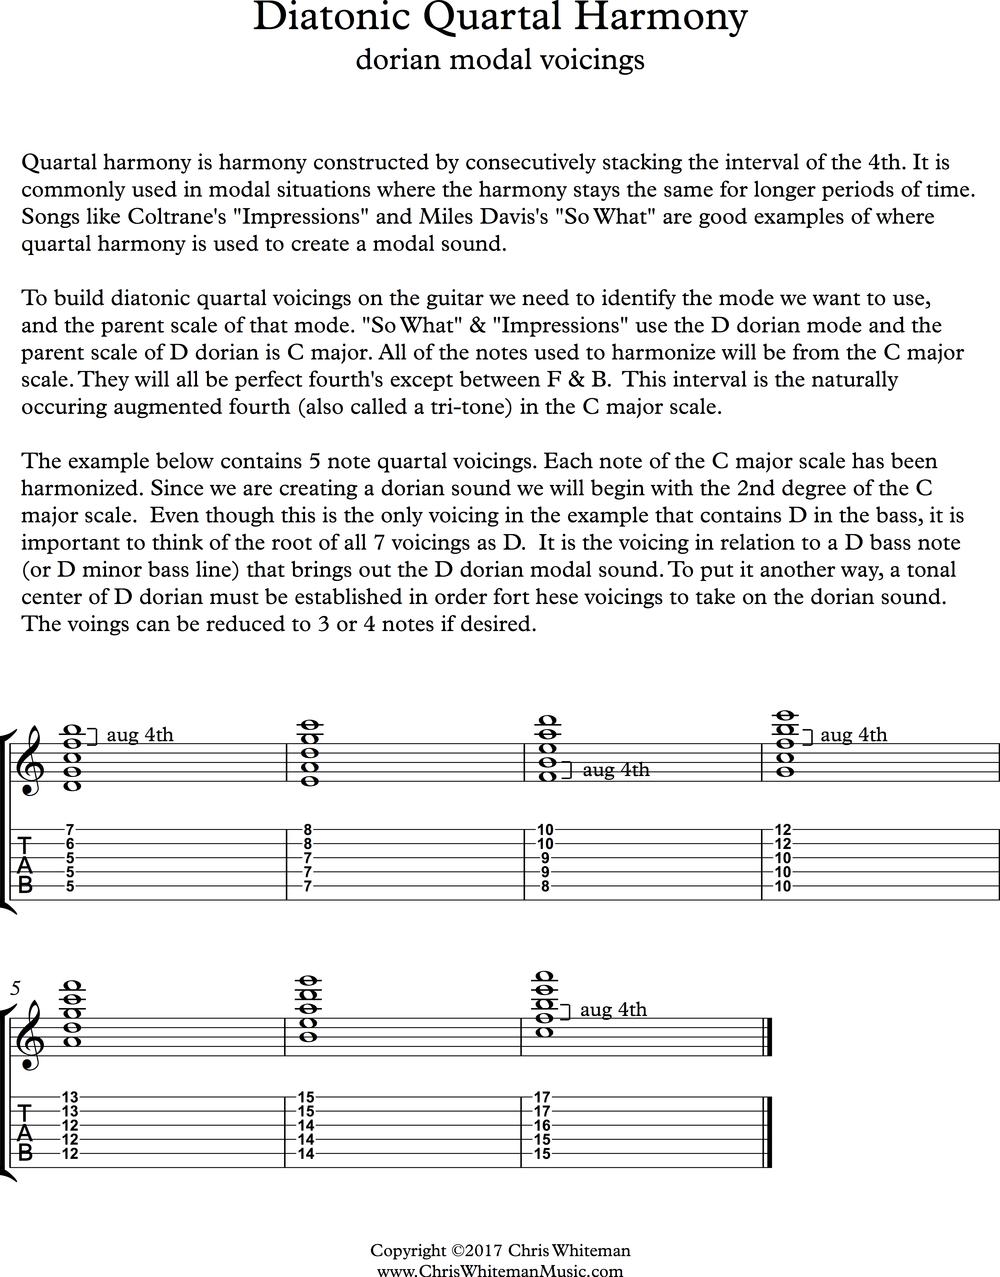 Diatonic Quatal Harmony.png